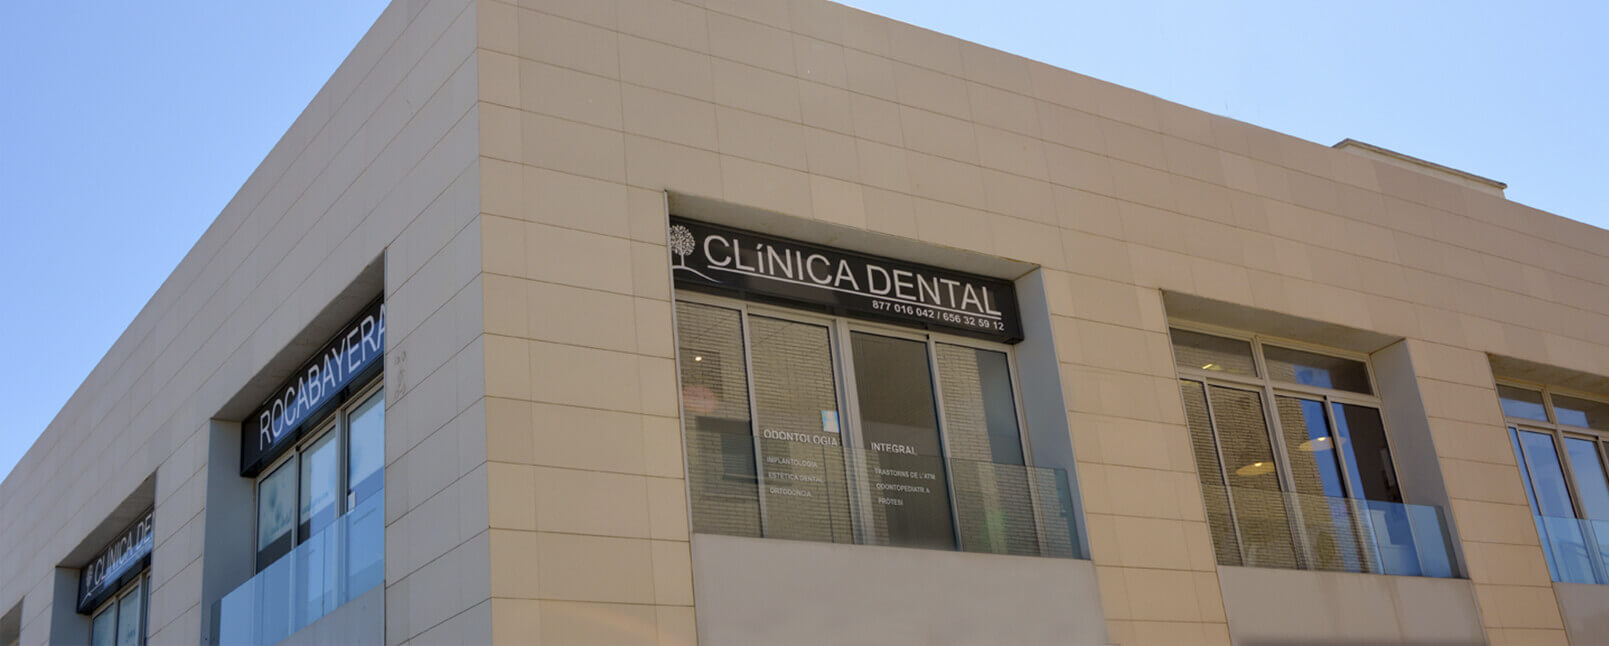 cunit-clinica-dental-rocabayera-exterior